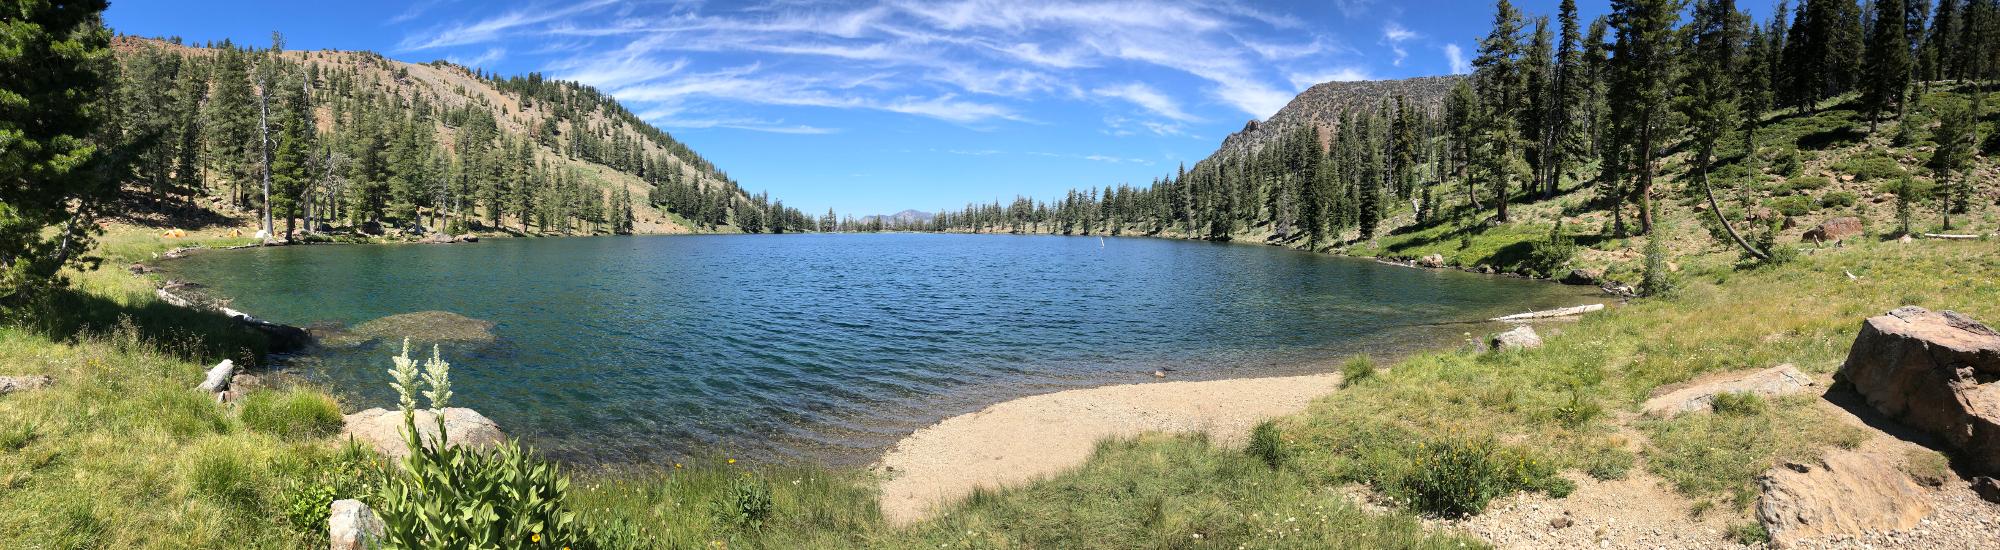 Deadfall Lake in Trinity Alps Wilderness